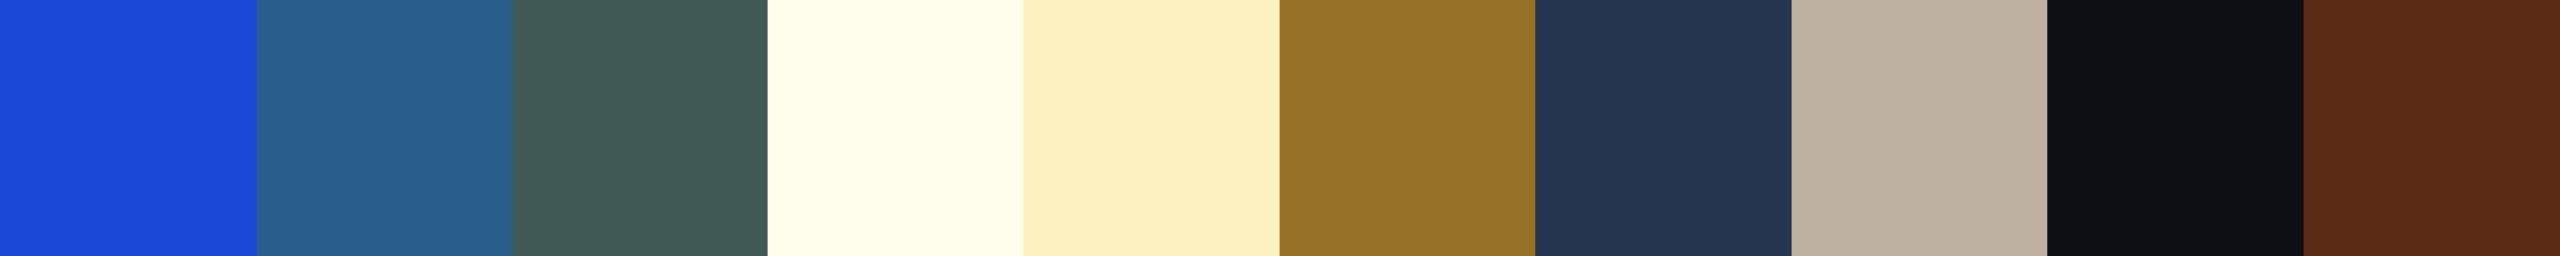 118 Porlana Color Palette